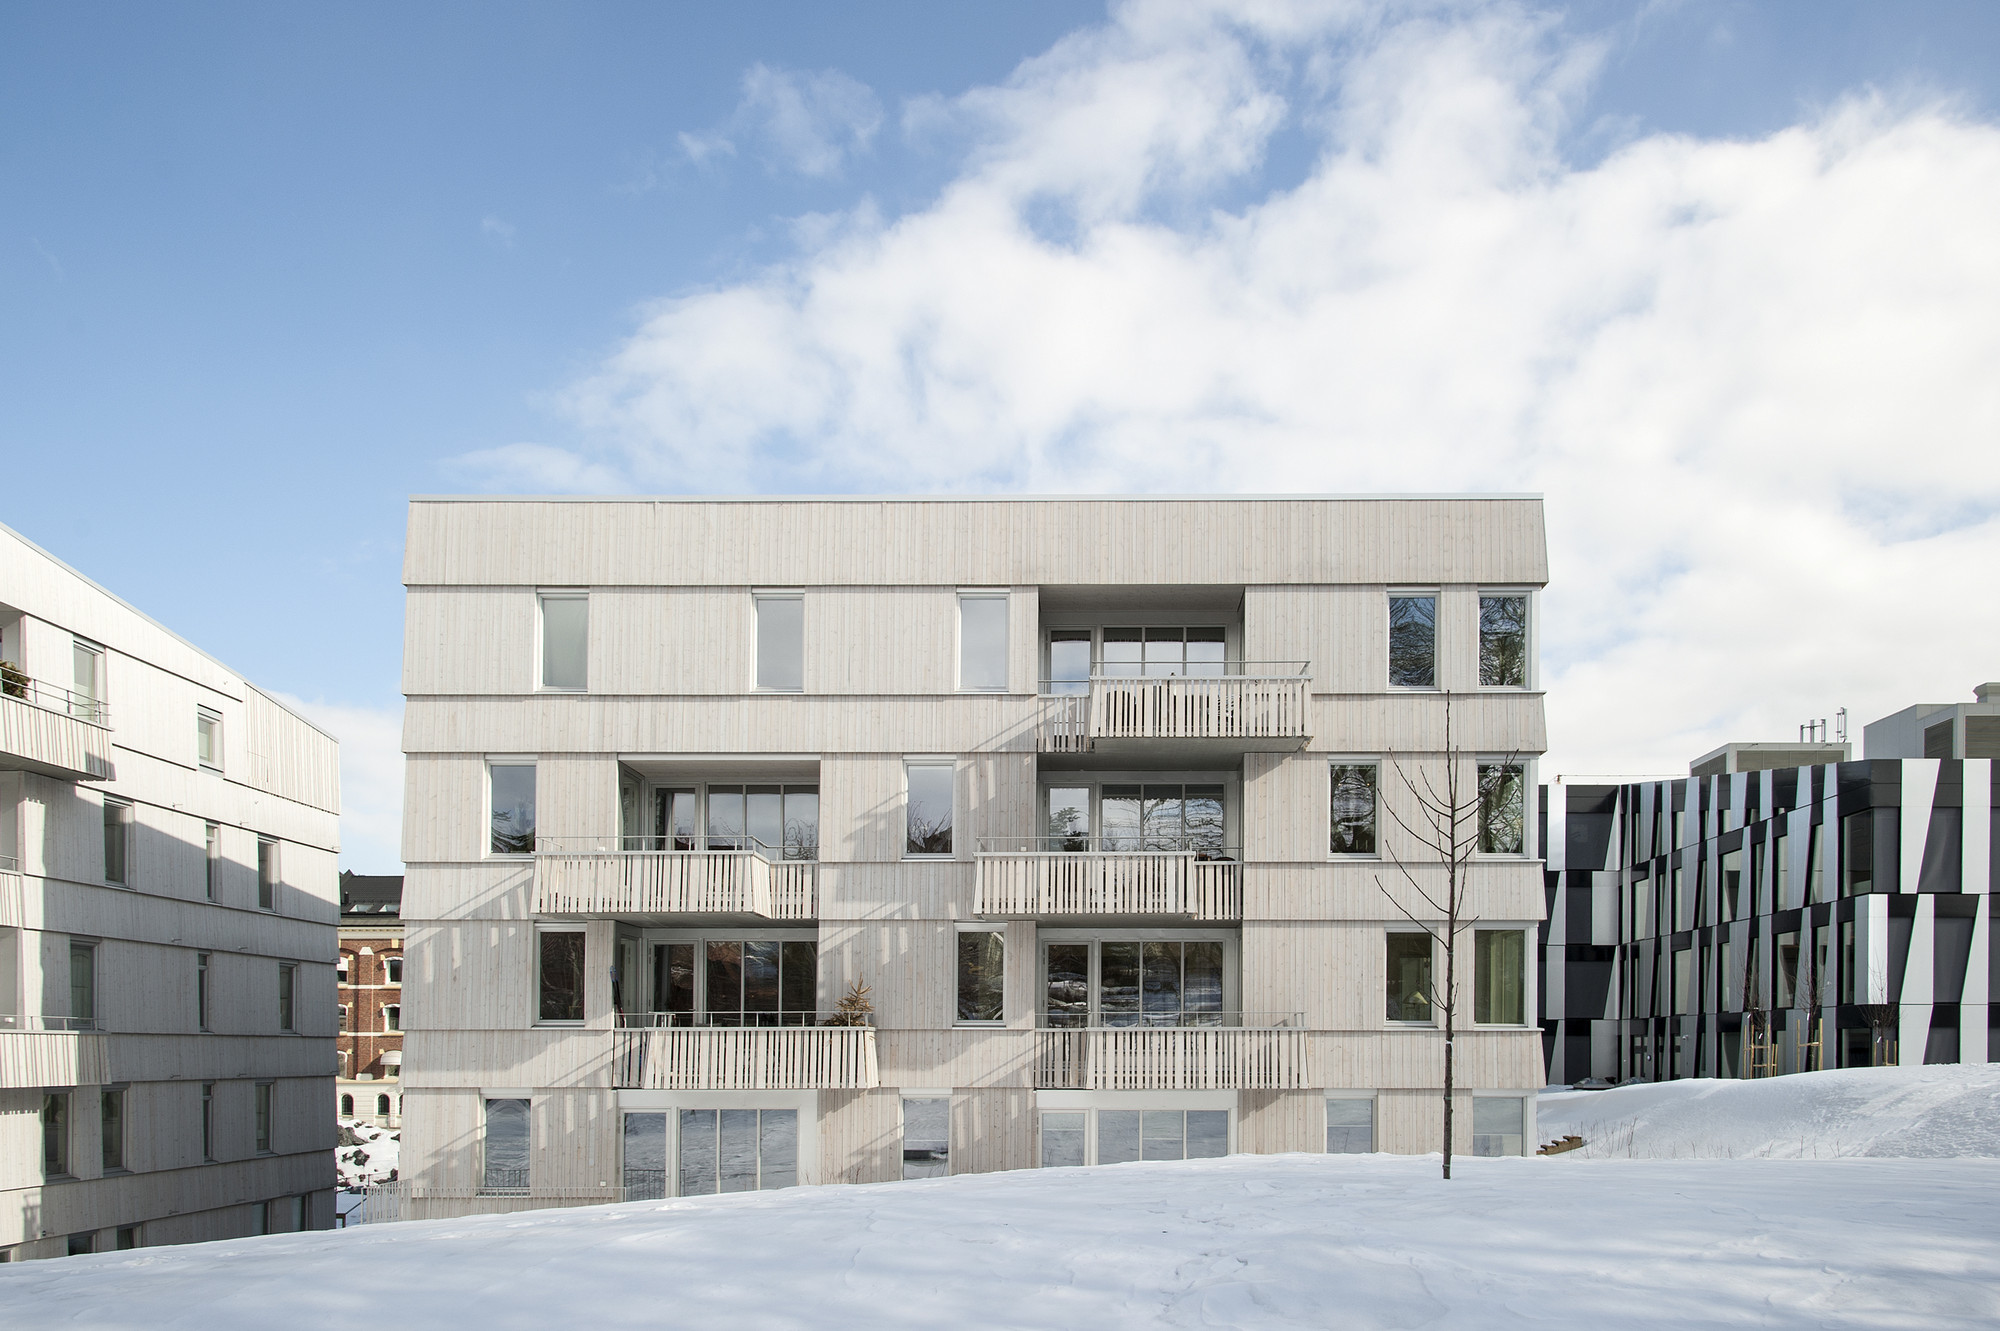 Spikerverket Housing / April Arkitekter, © Jiri Havran